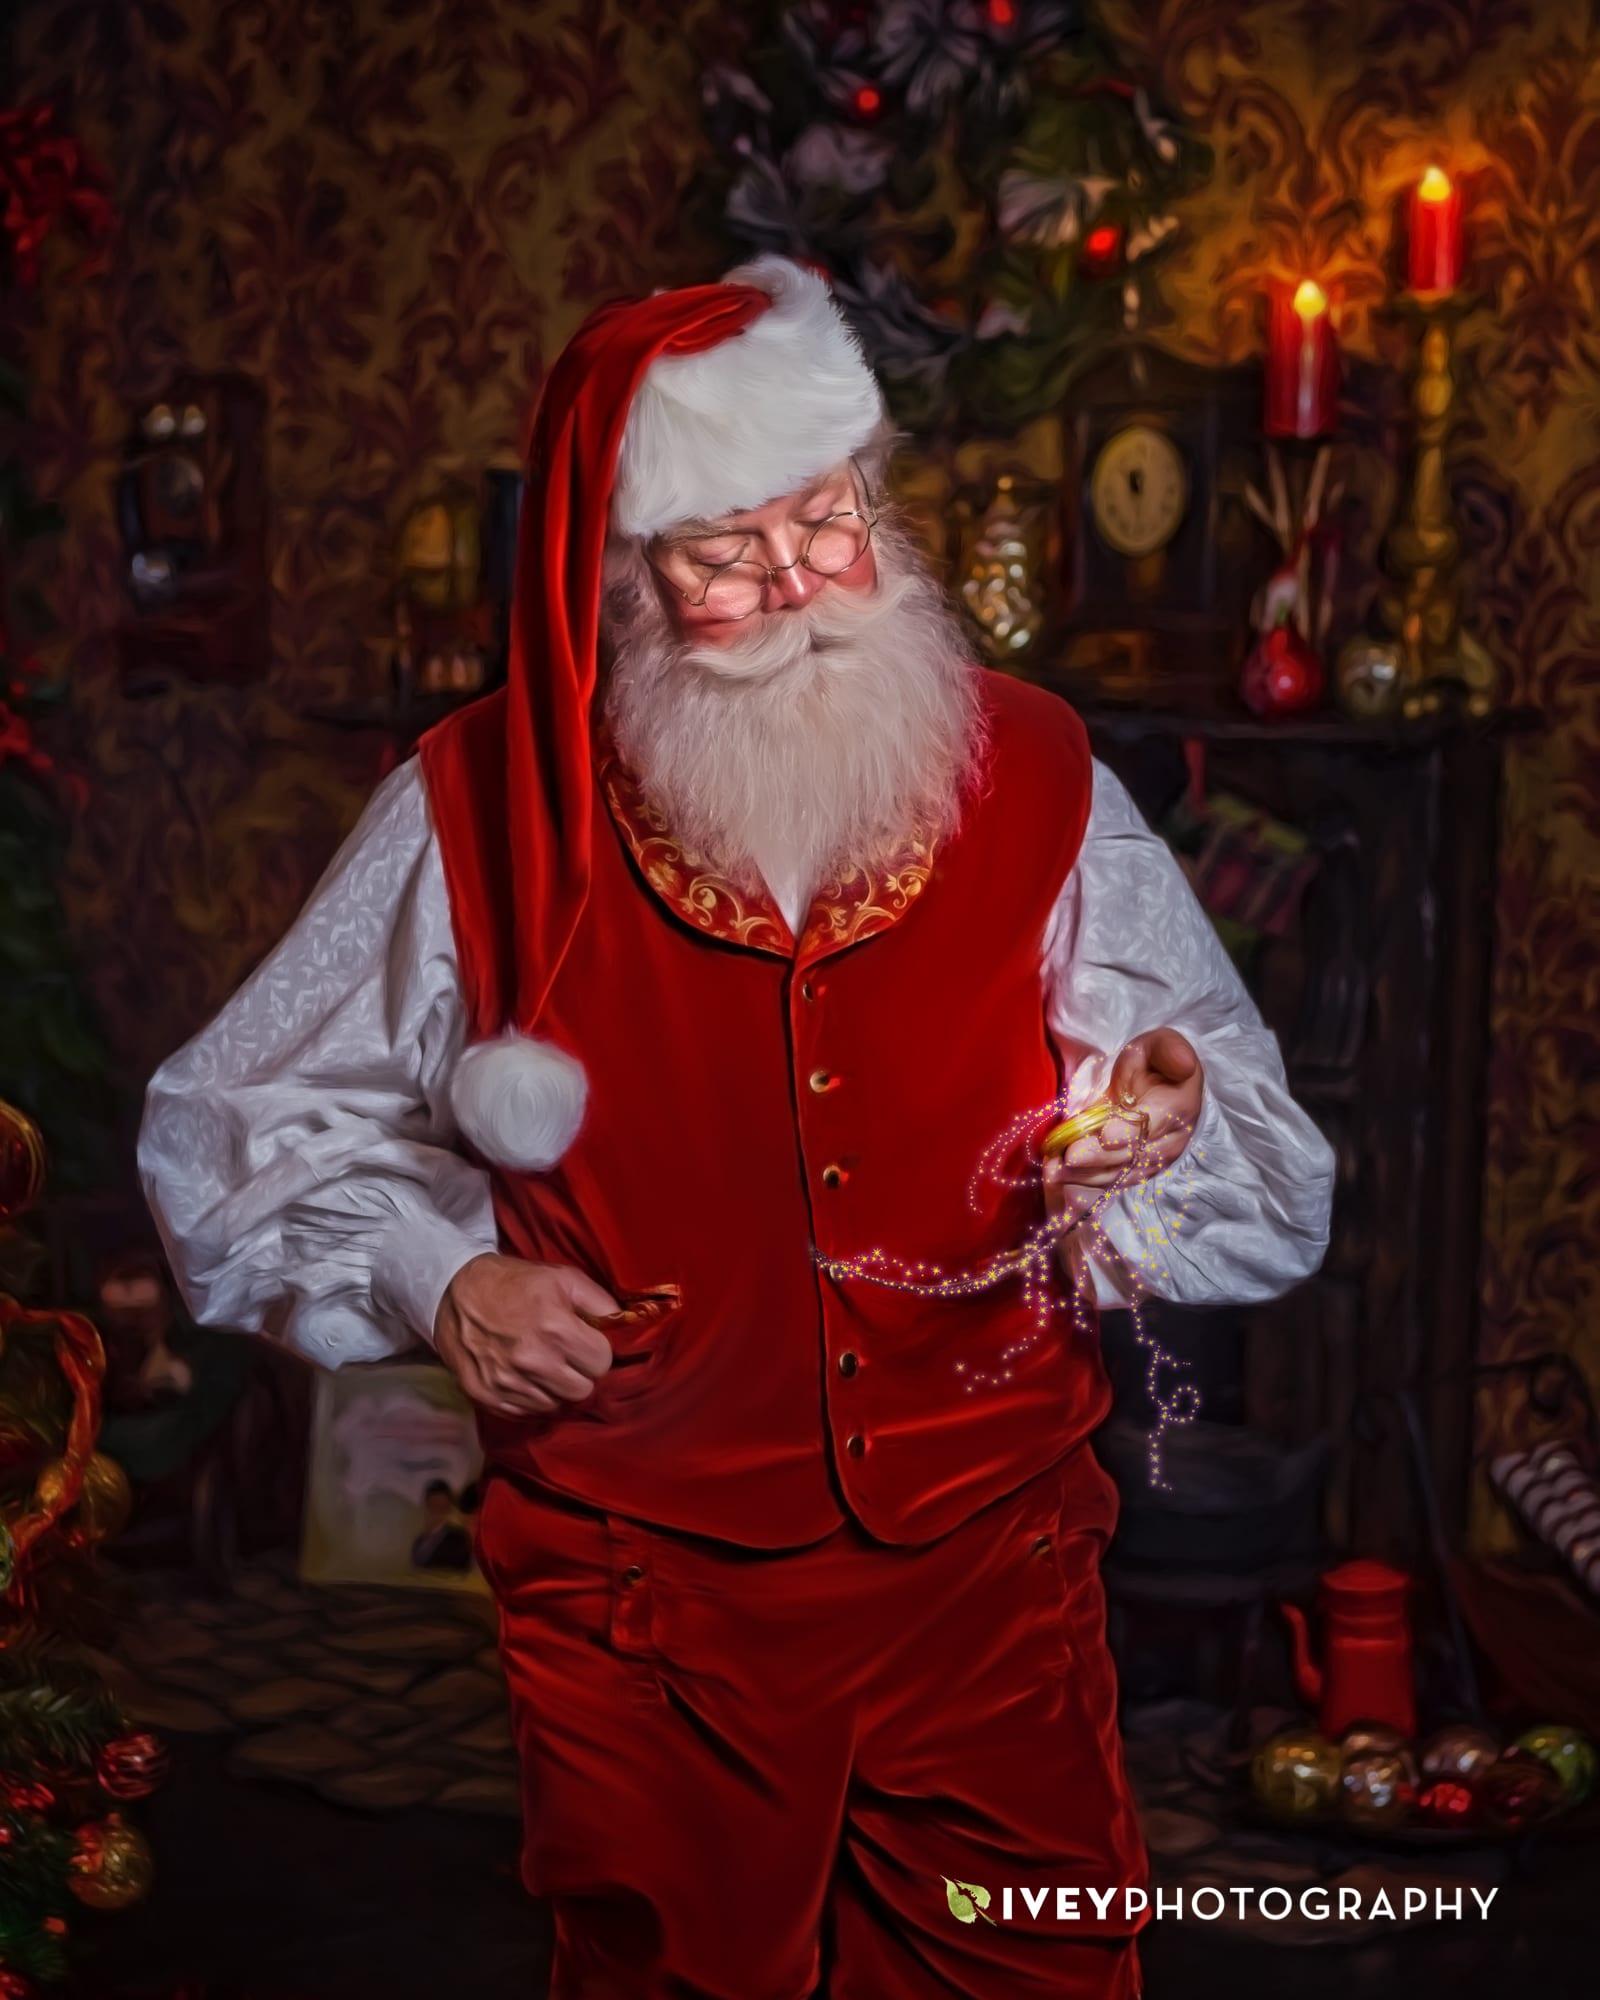 Santa Chuck Lee in The Storybook Santa Experience at Ivey Photography